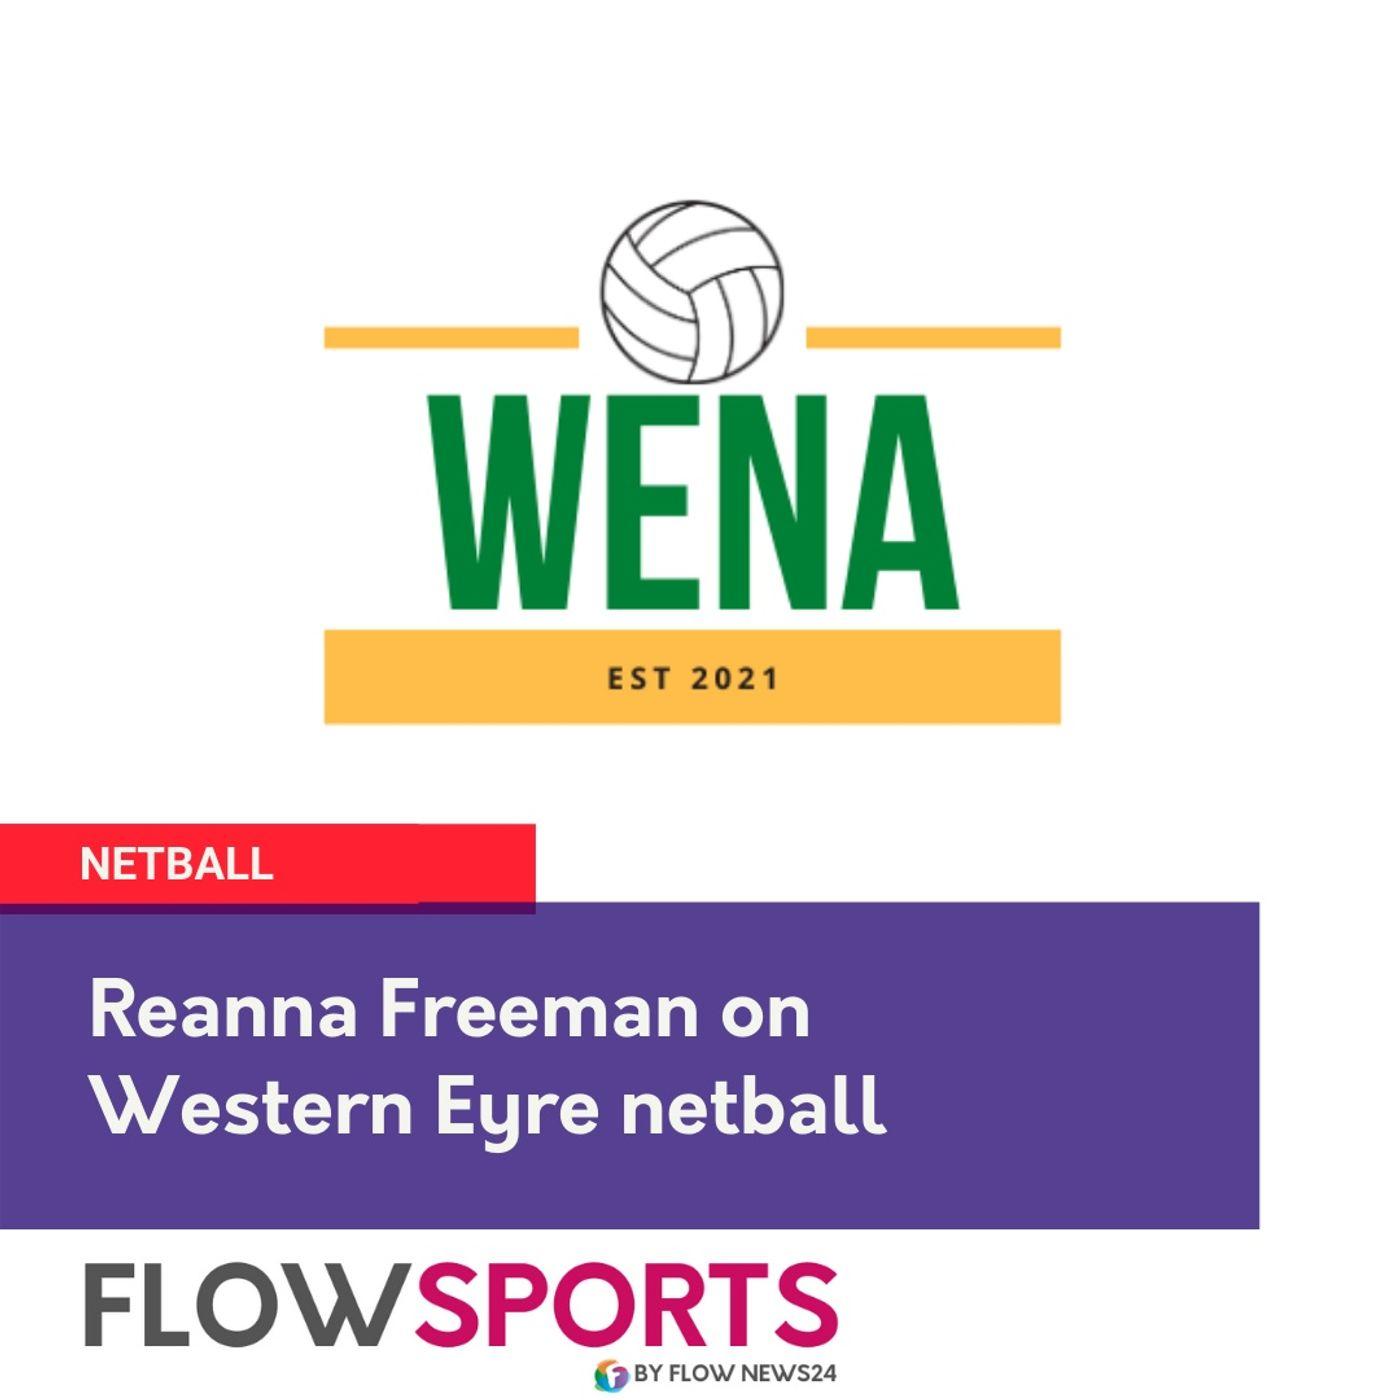 Reanna Freeman on Western Eyre Netball after round 8 heading into the Queen's Birthday long weekend break @NetballSA